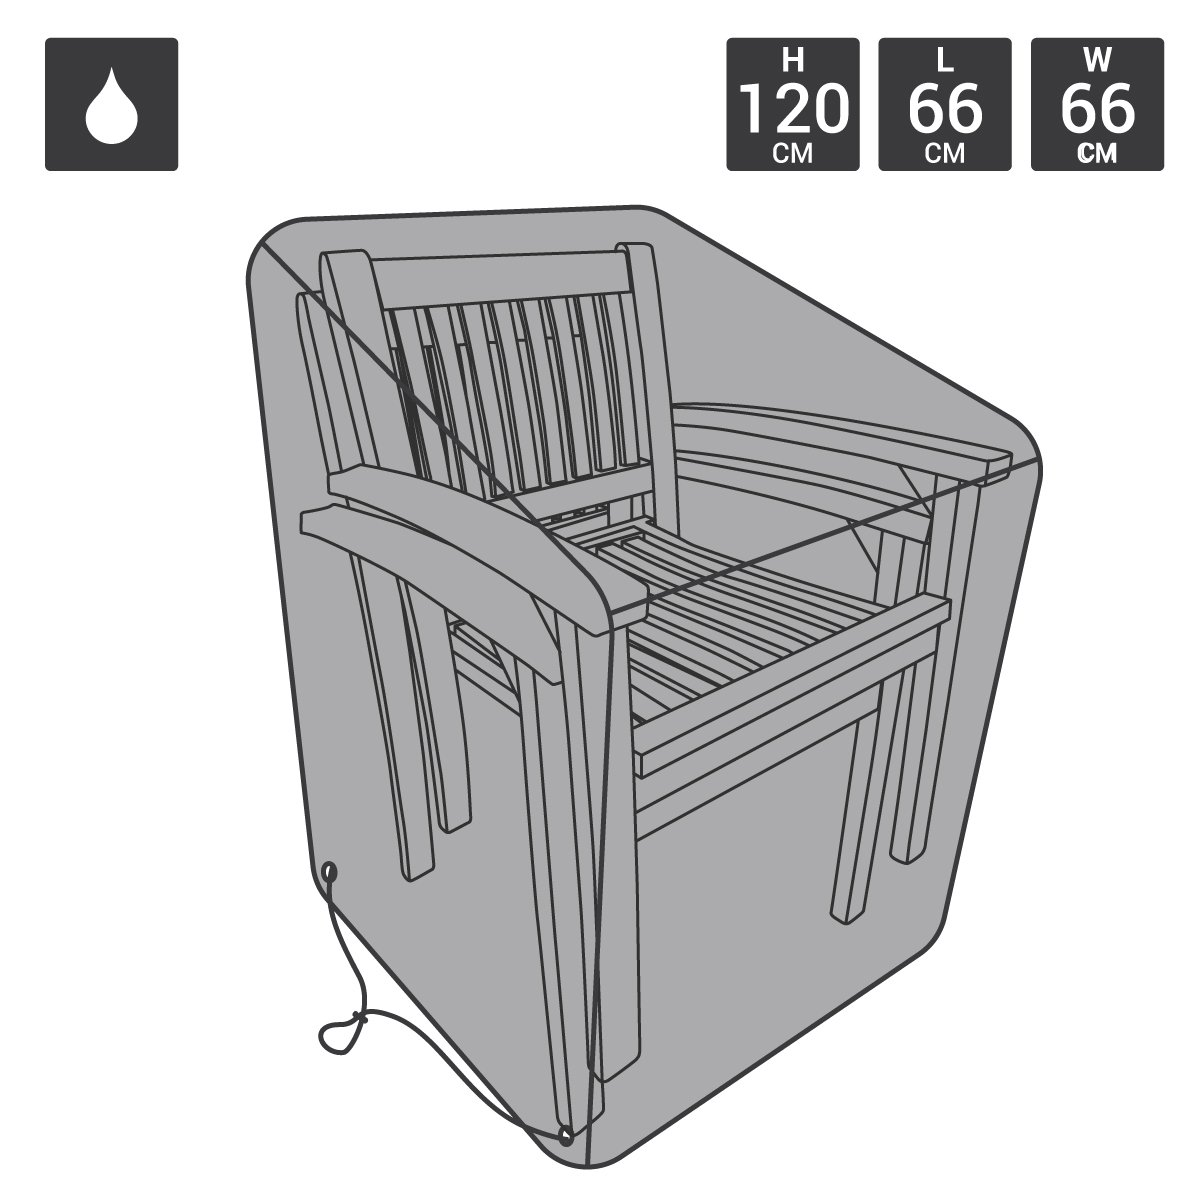 Bentley - telo protezione idrorepellente premium per sedie da giardino impilabili Charles Bentley